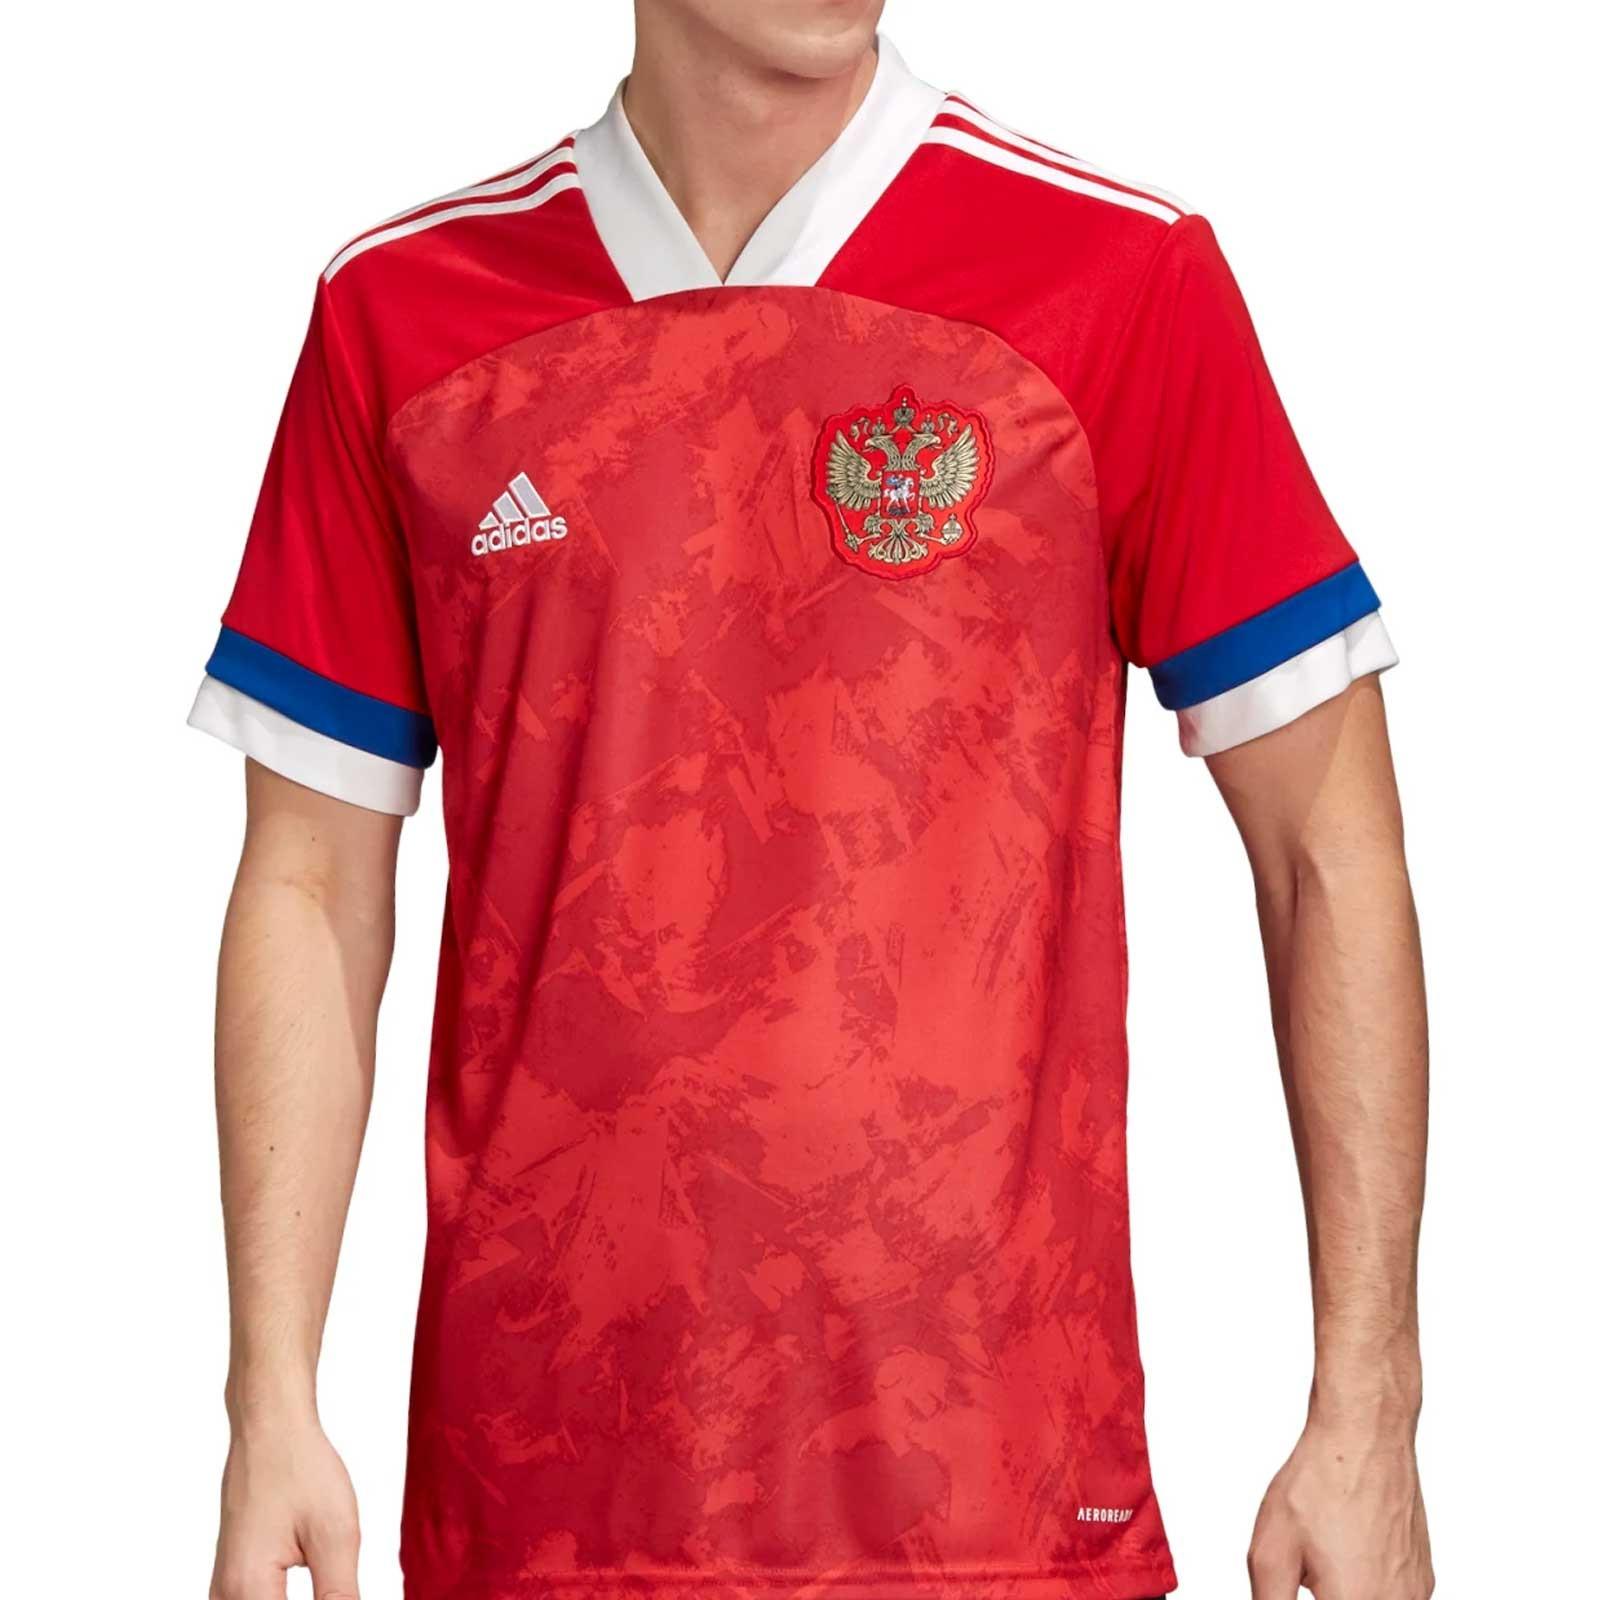 Camiseta Adidas Rusia 2020 2021 Roja Futbolmania